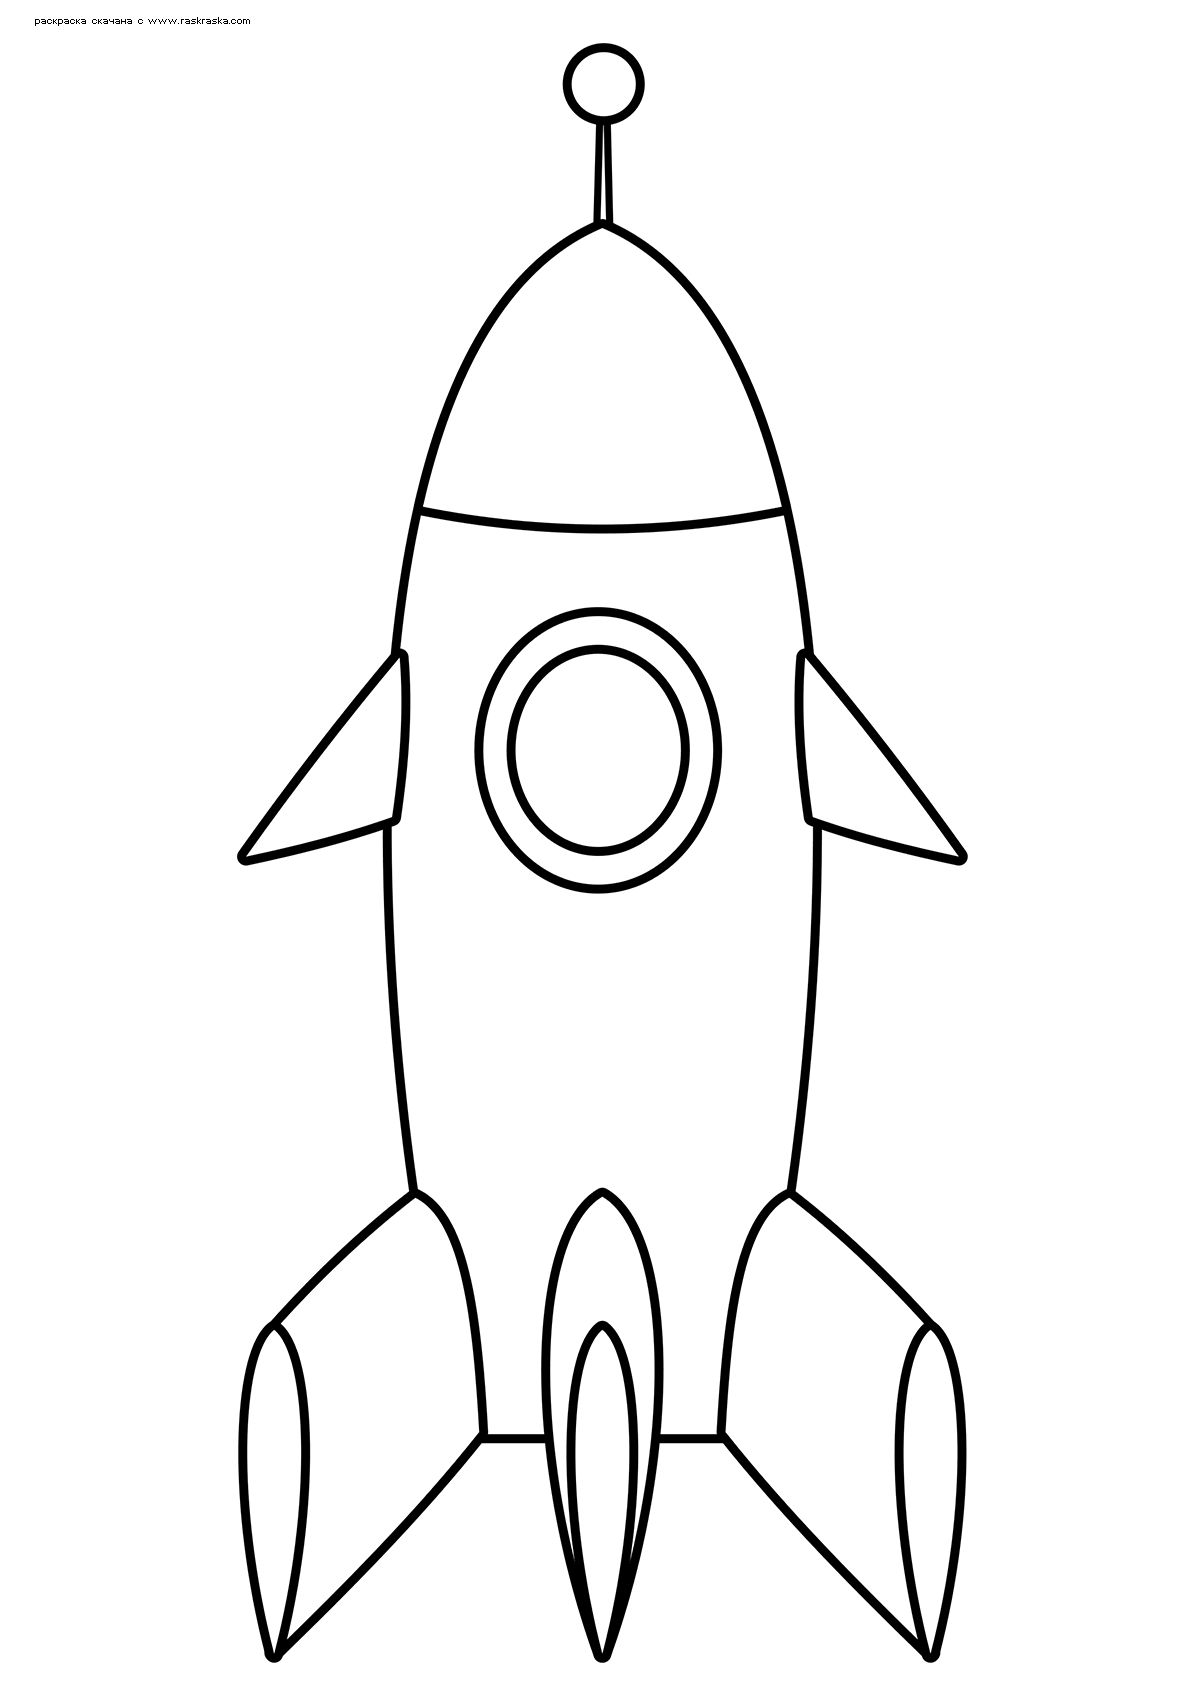 Раскраска Ракета. Раскраска ракета, игрушка